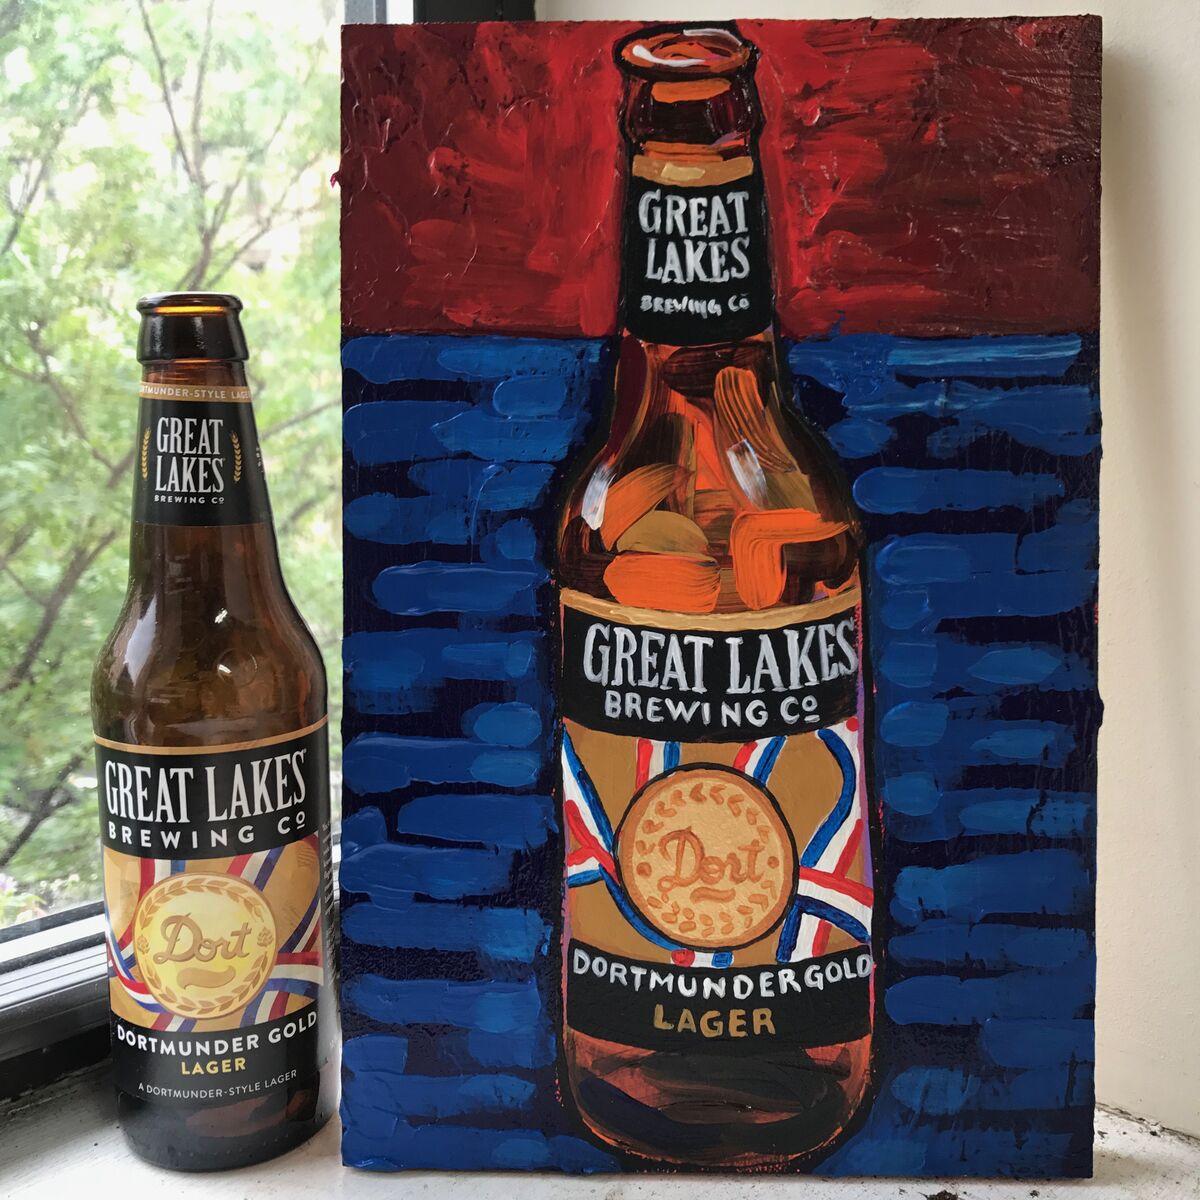 Tom Sanford, 88 - Great Lakes Lager, 2017. Courtesy of the artist.